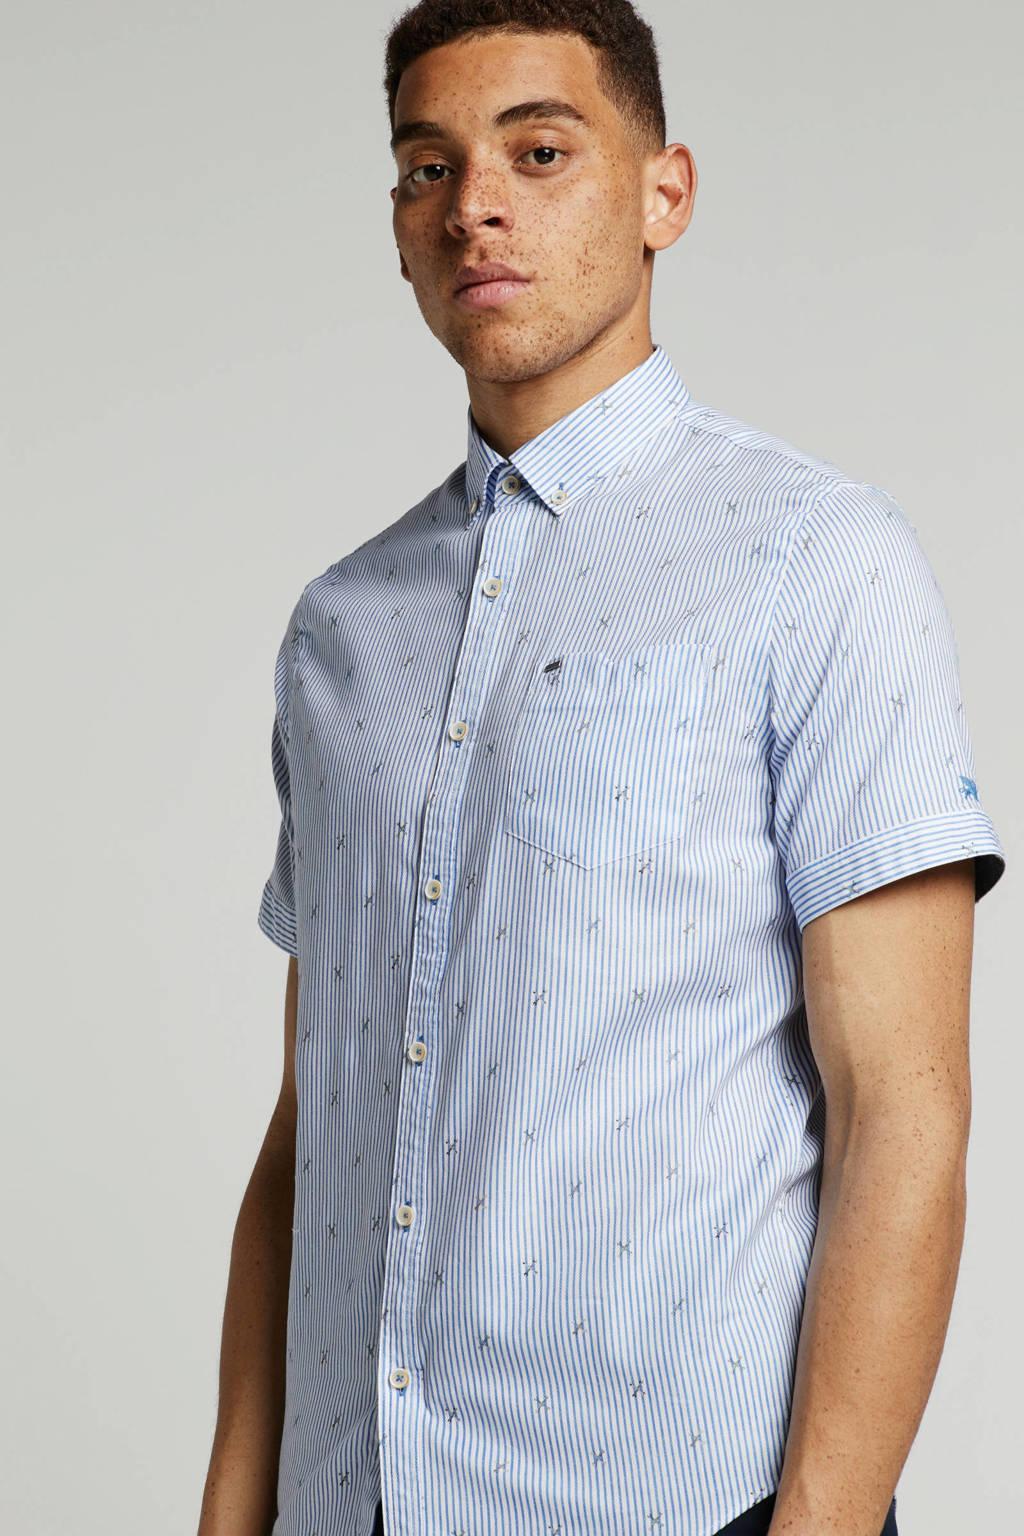 Vanguard overhemd met allover print, Lichtblauw/ wit